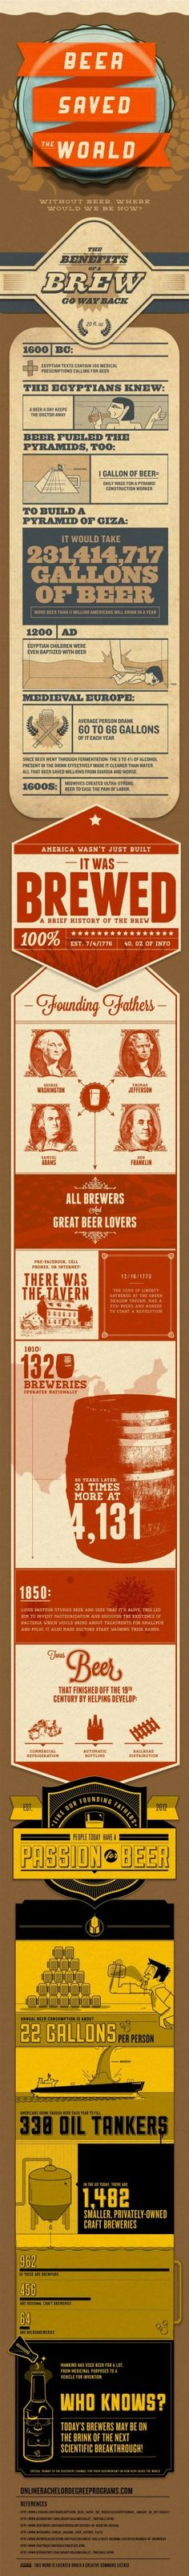 infographics by elva